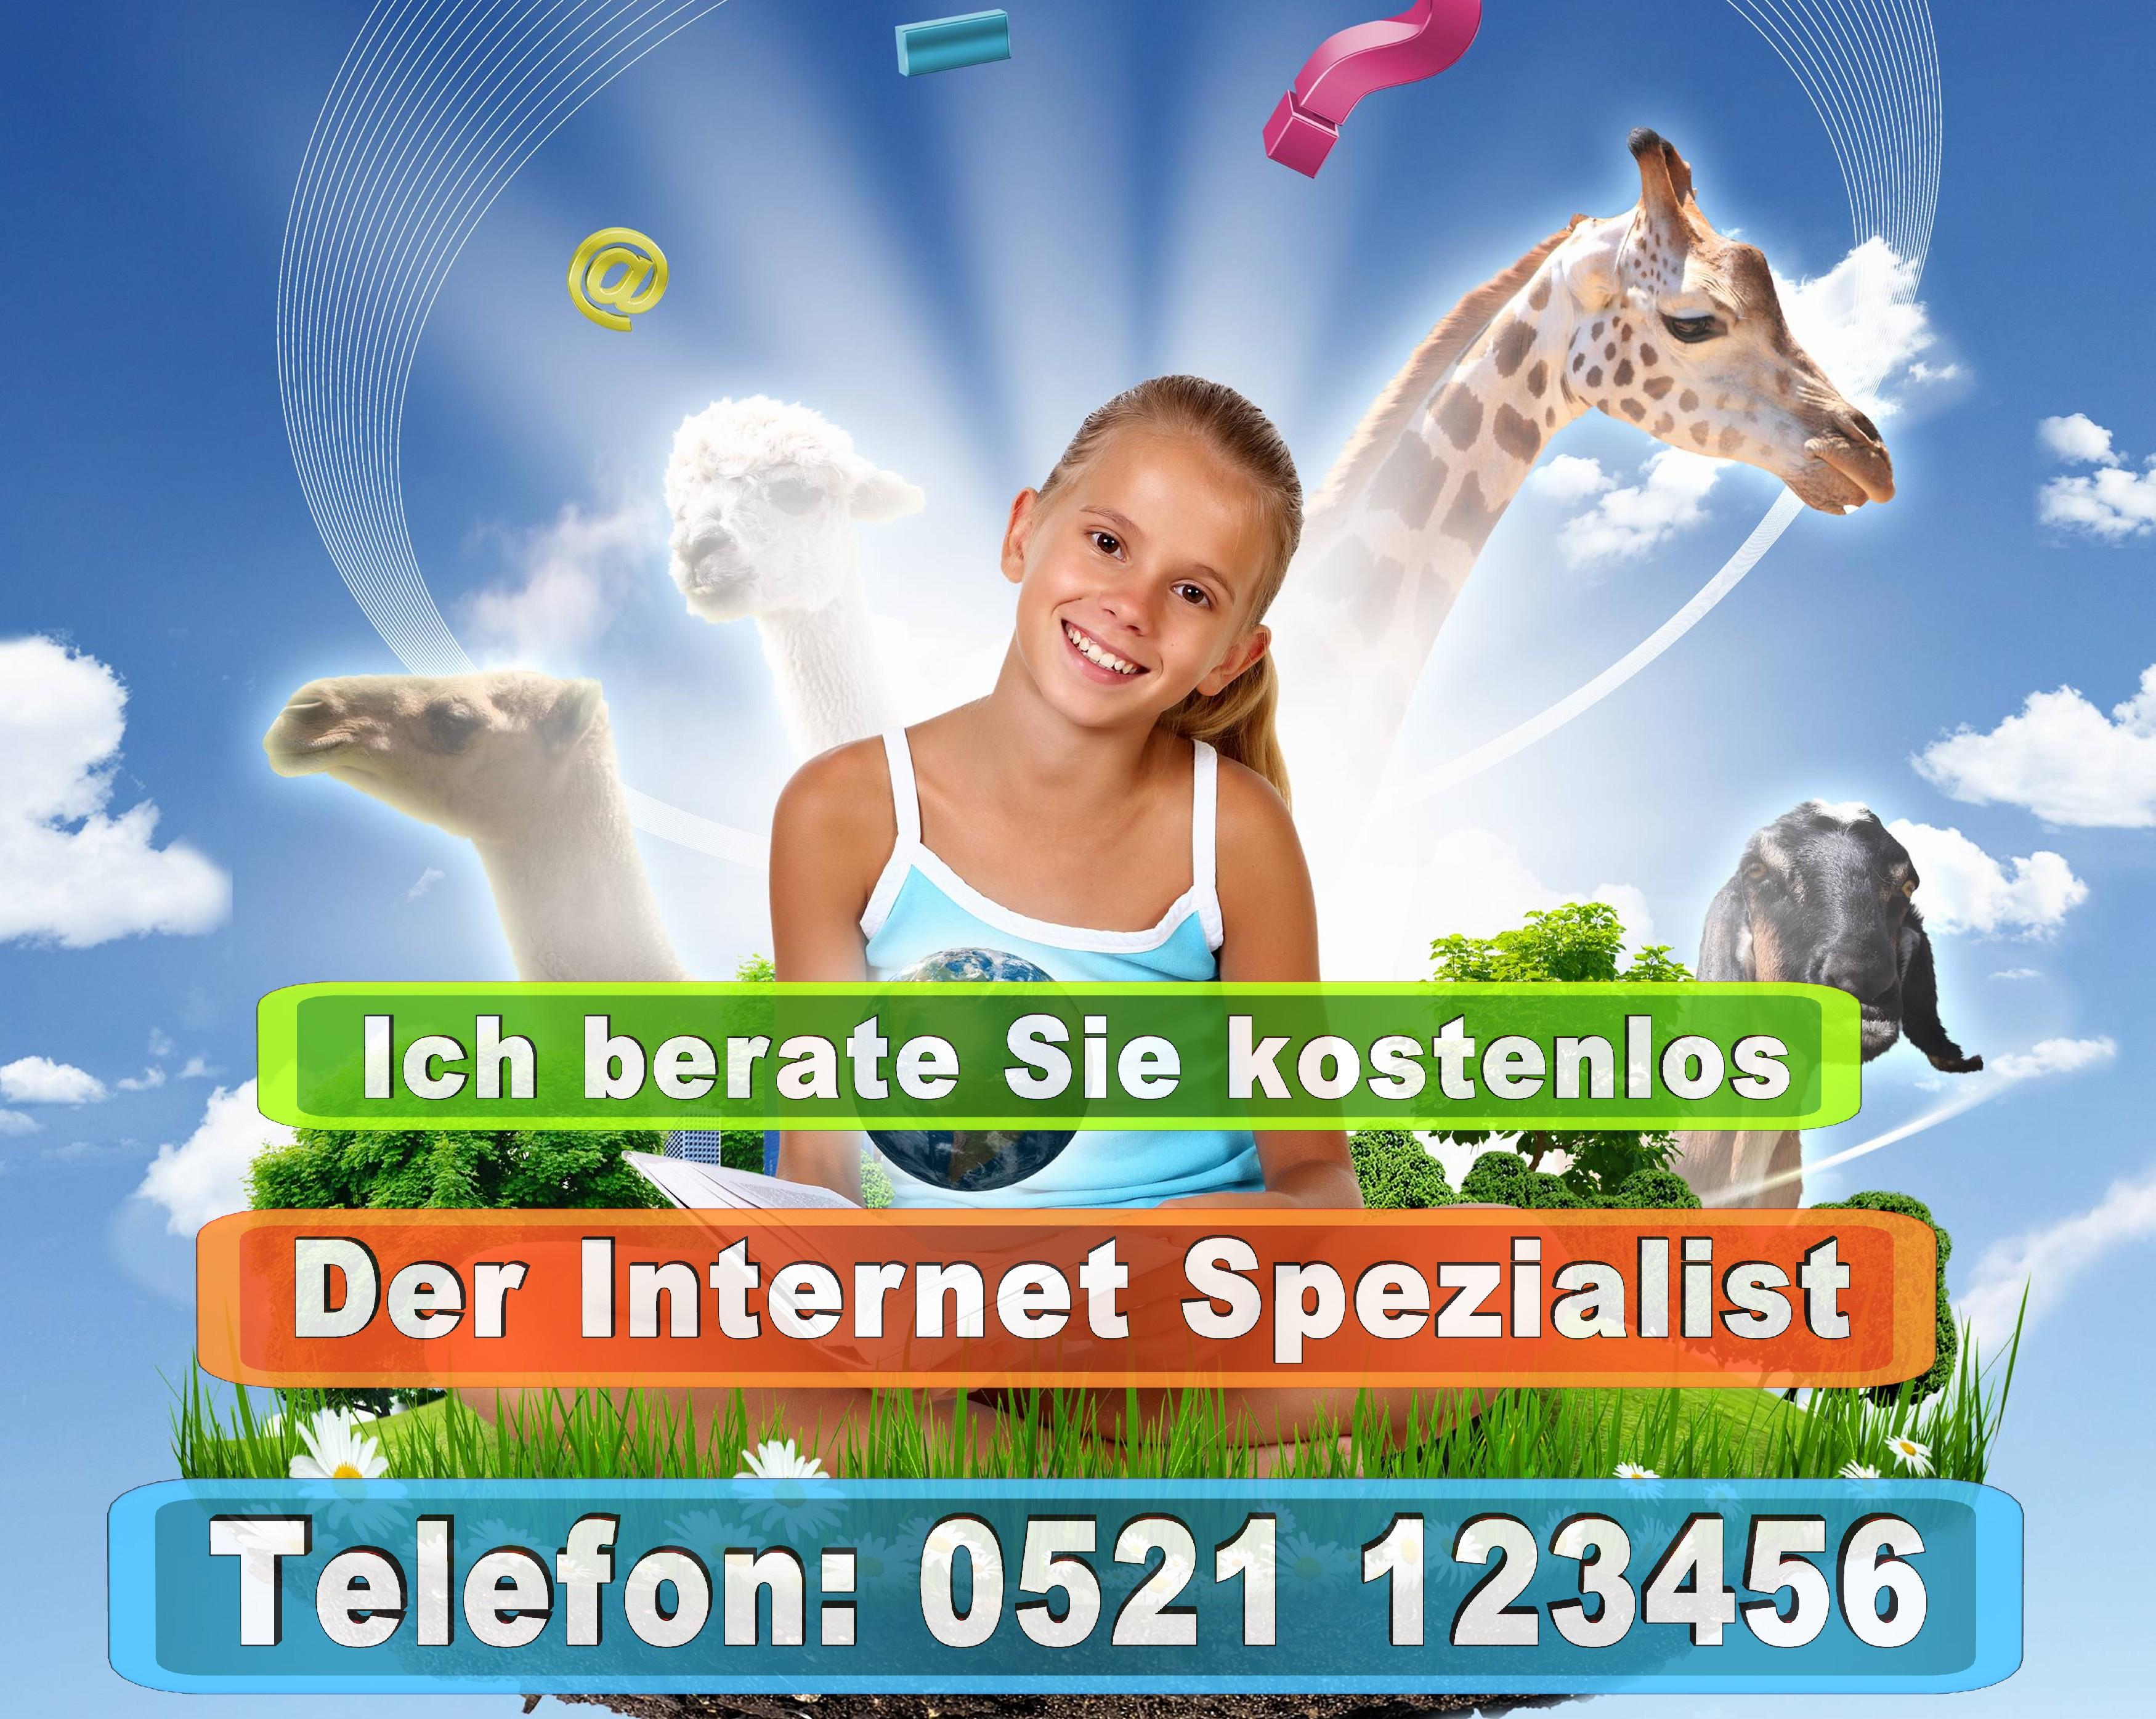 Schulen Bielefeld Schule Grundschule Sonderschule Hauptschule Realschule Schulhof Turnhalle Sporthalle Bielefeld NRW (2)